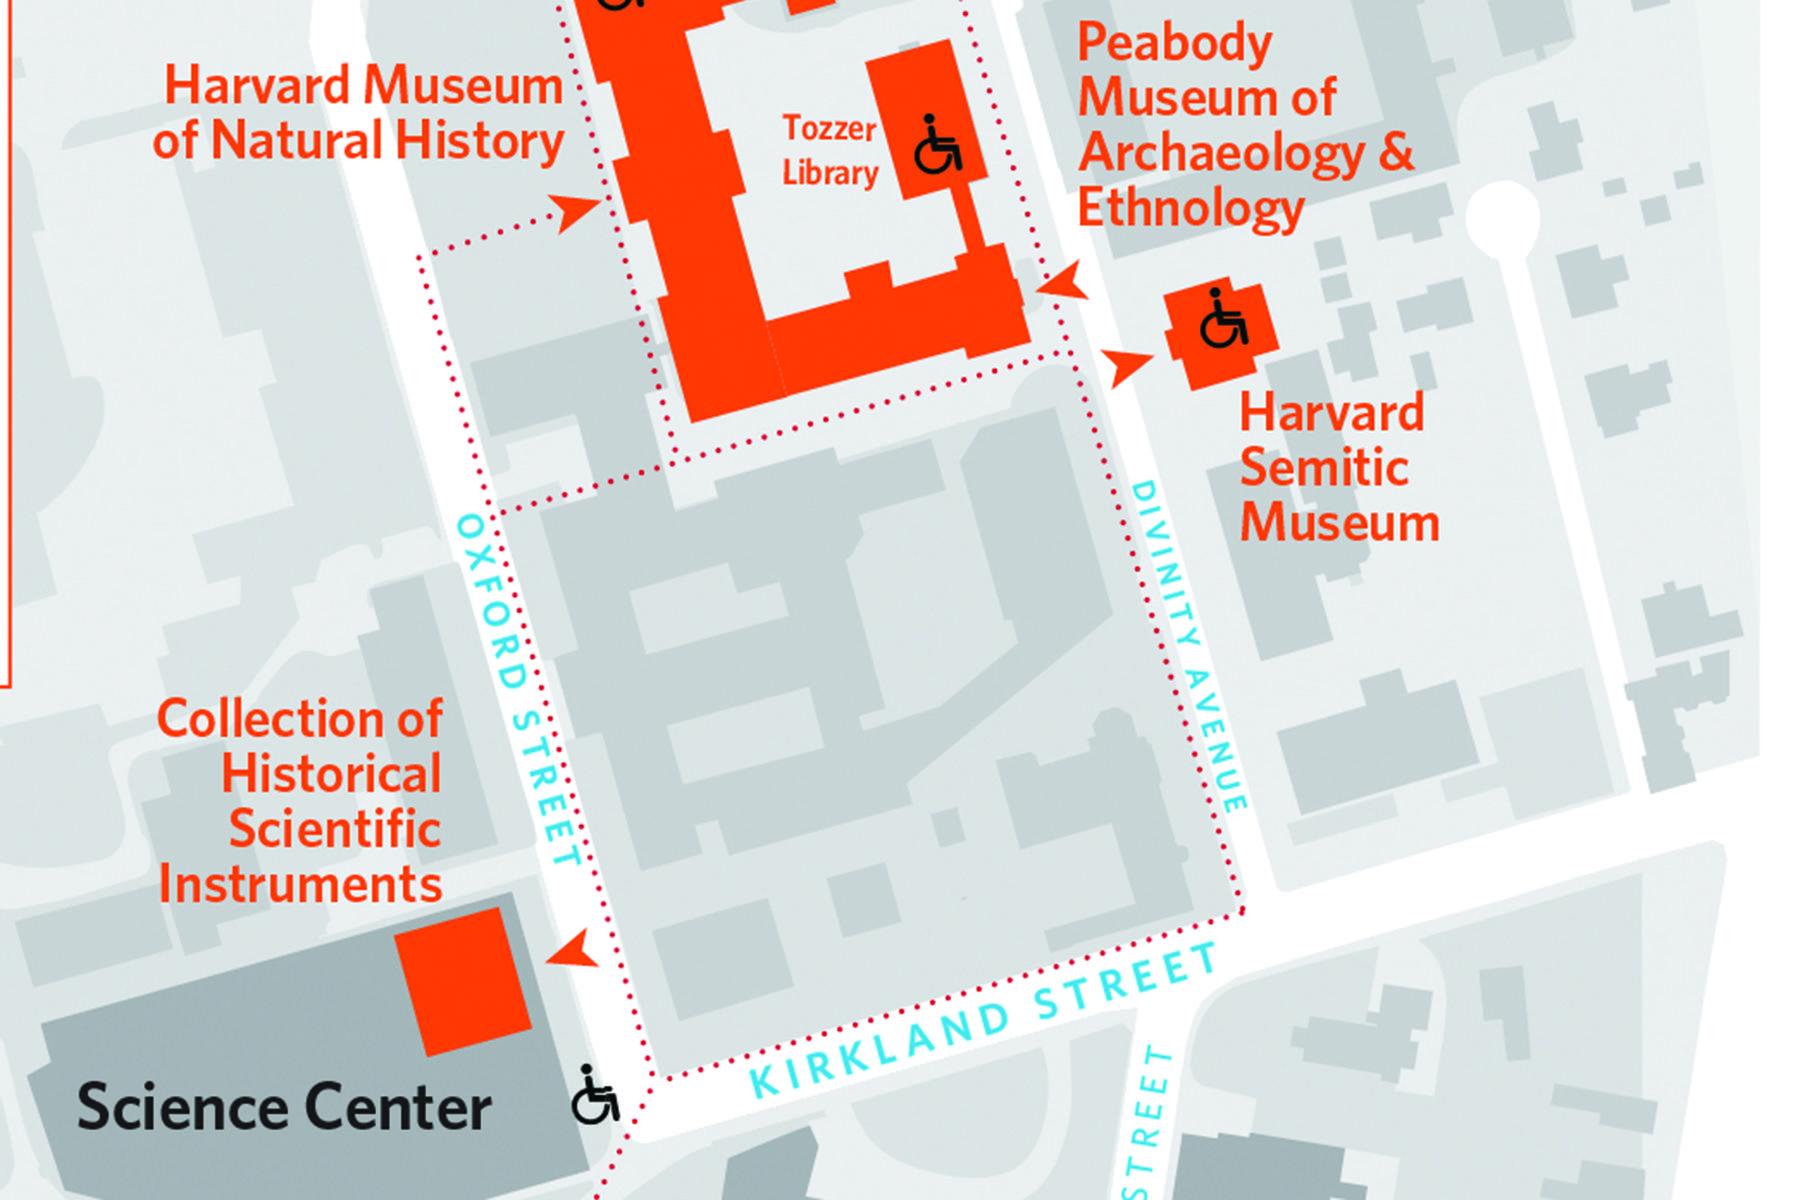 Boston Subway Map Harvard Square.Directions And Parking Harvard Museum Of Natural History